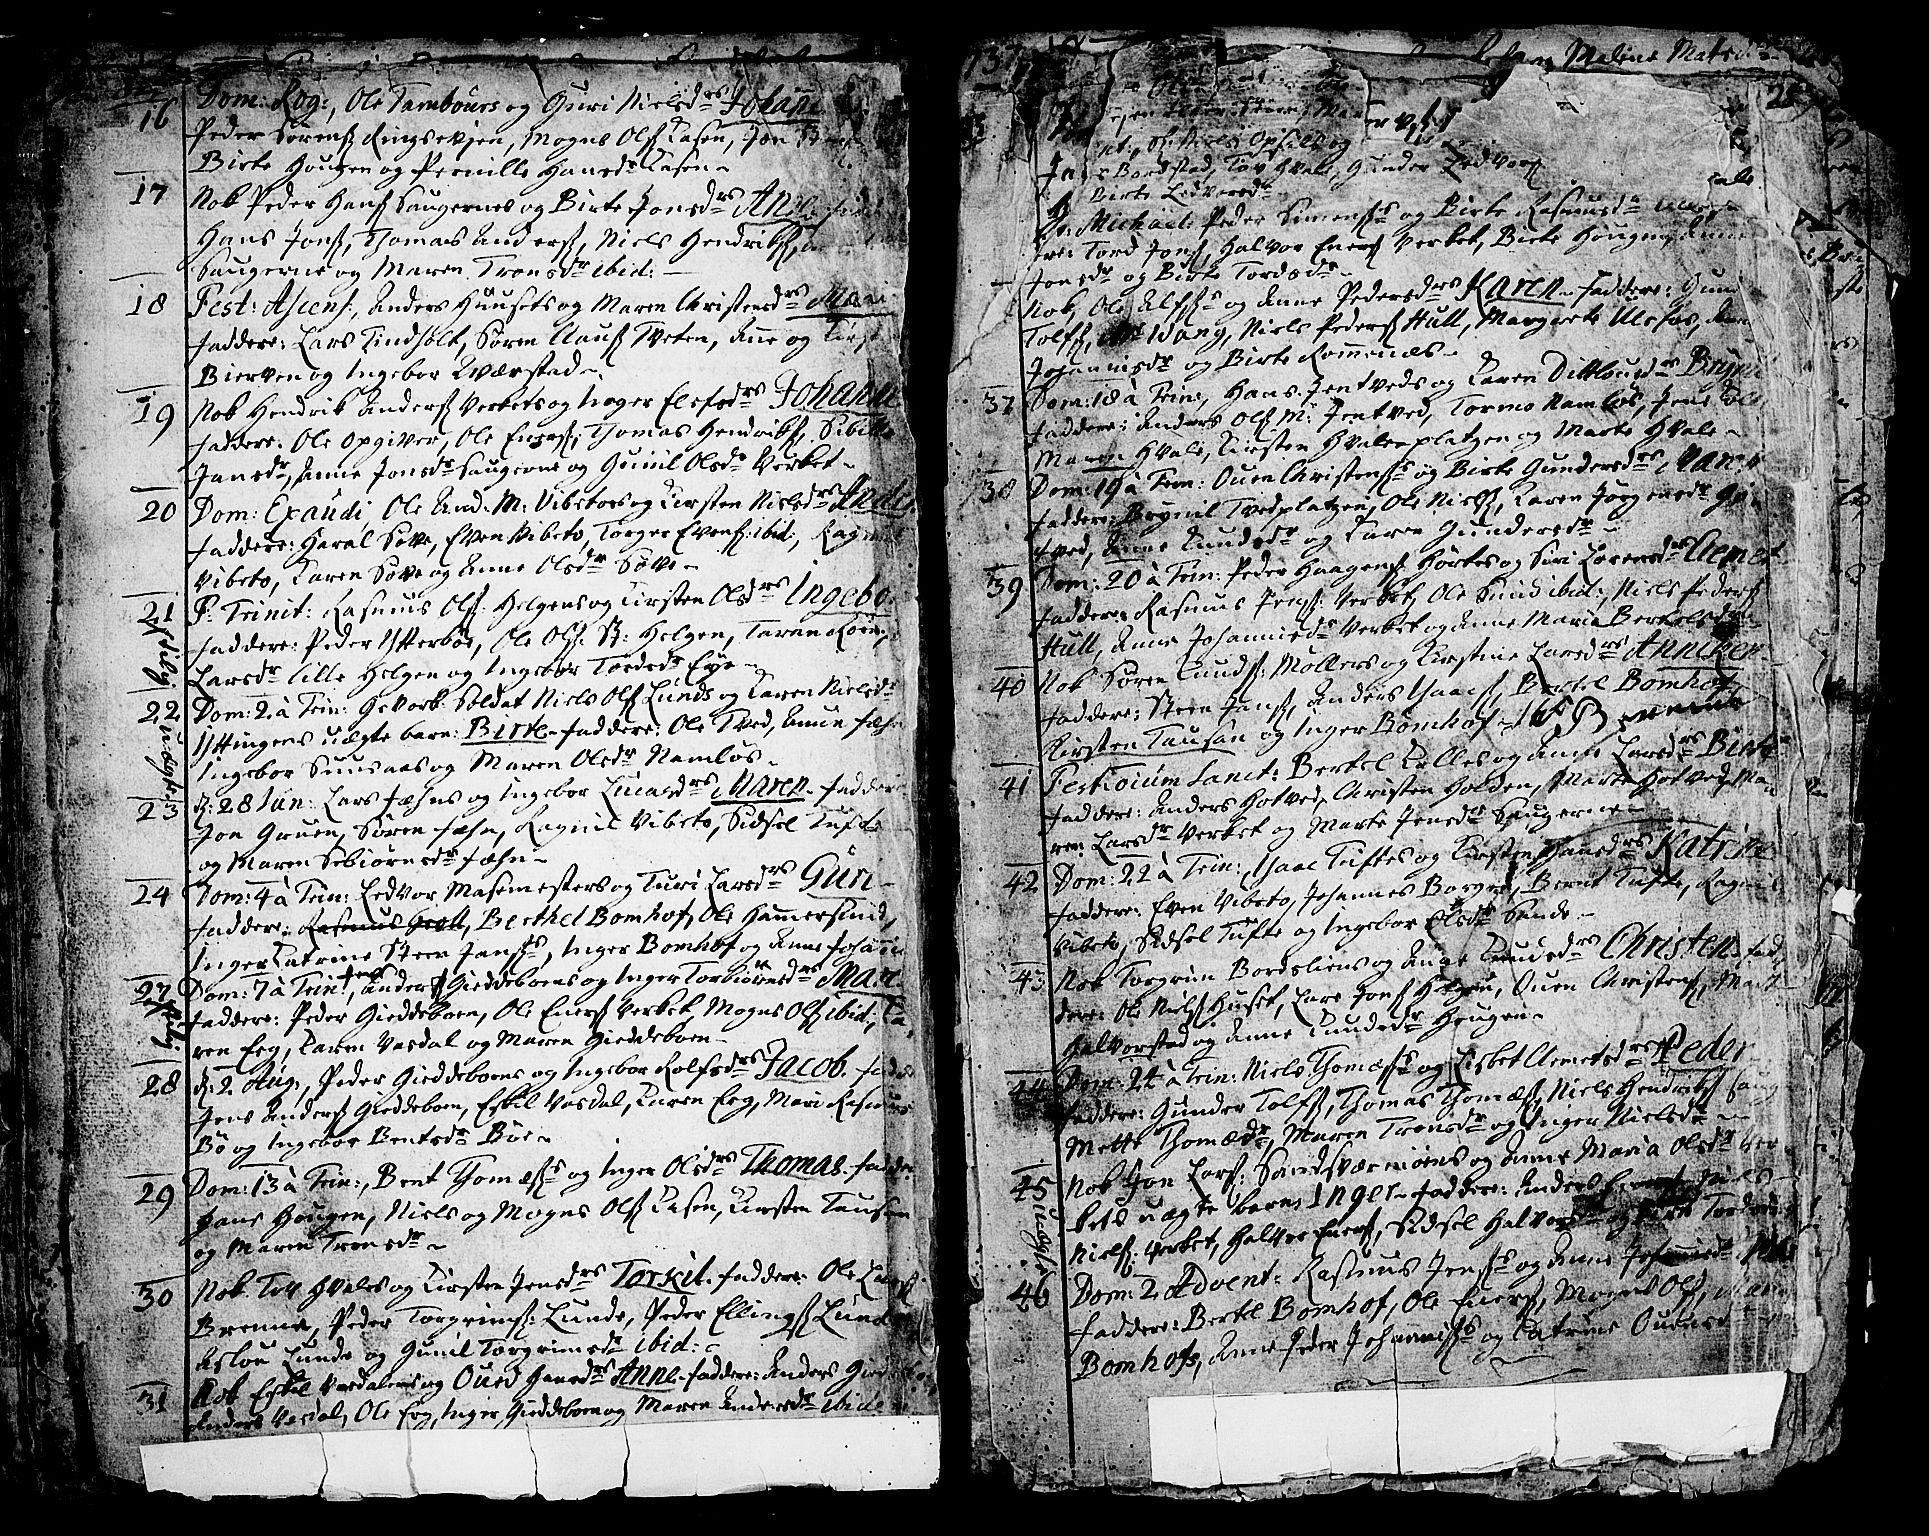 SAKO, Holla kirkebøker, F/Fa/L0001: Ministerialbok nr. 1, 1717-1779, s. 21